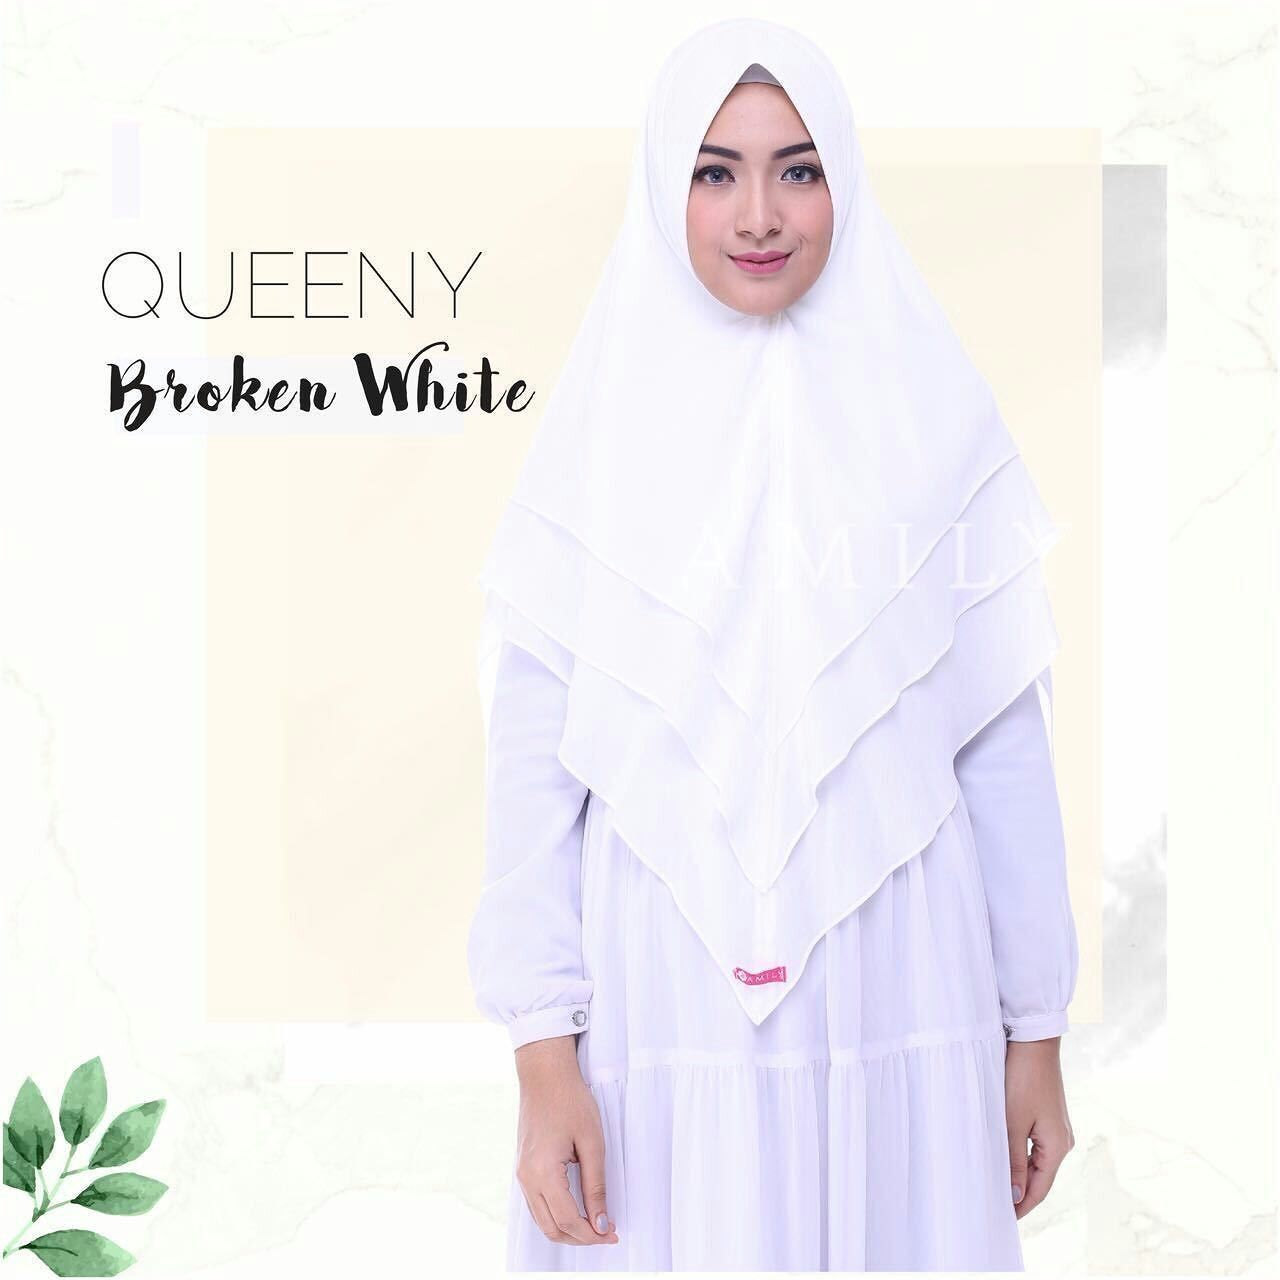 Amily Khimar Queeny Broken White Hijab Kerudung Khimar Jilbab Syari Untukmu Yg Cantik Syari Dan Trendy Muslim Fashion Hijab Hijab Fashion Muslim Fashion